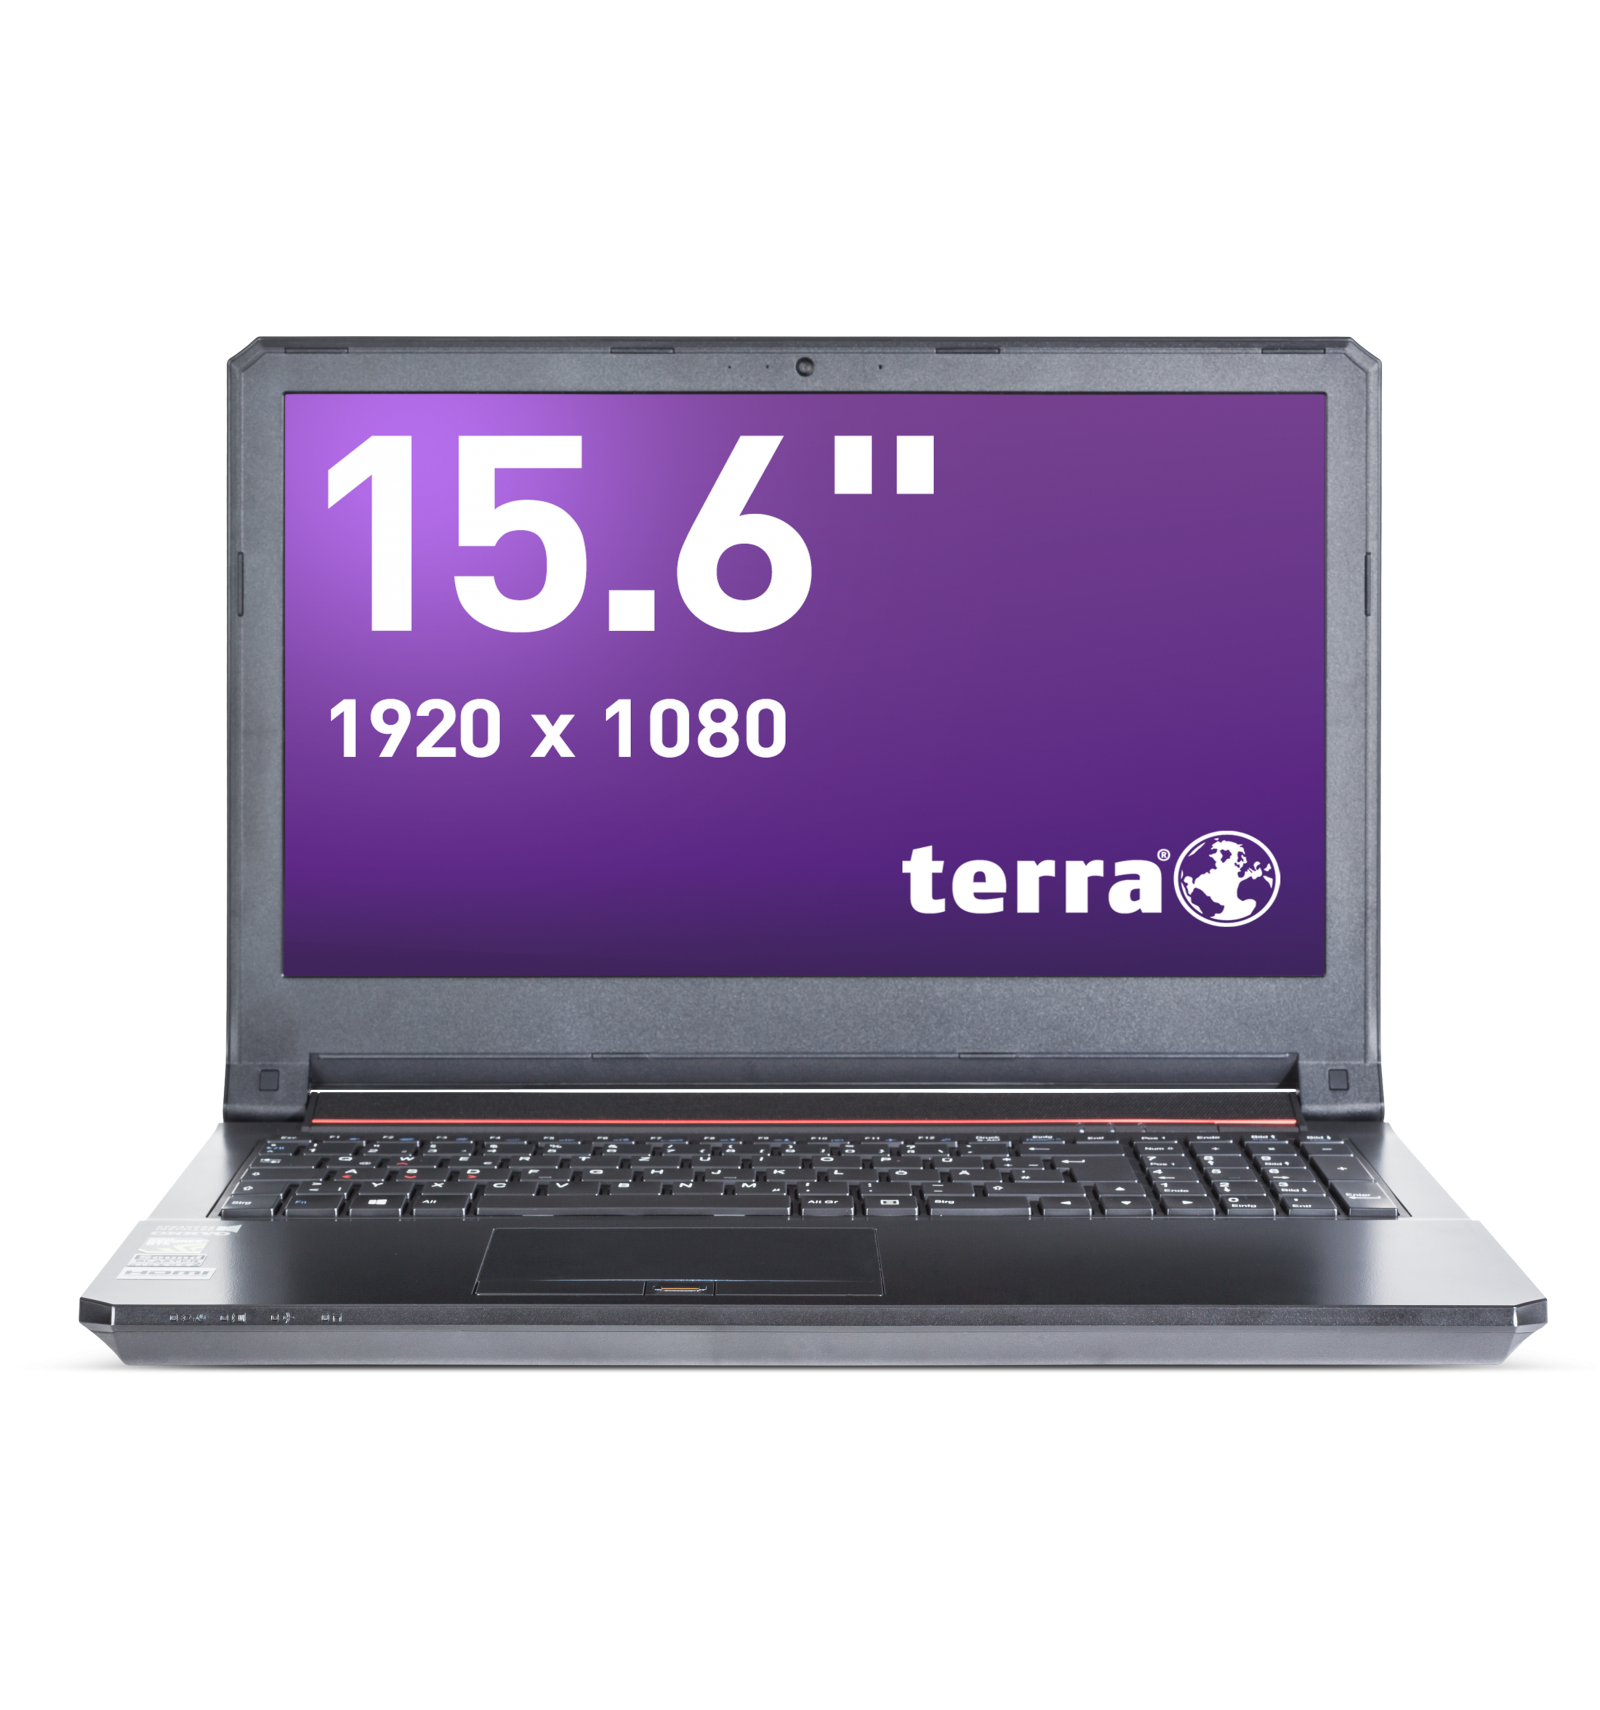 ordinateur portable 15 6 terra mobile 1549 intel core i5 6300hq ghz 8go 240go ssd. Black Bedroom Furniture Sets. Home Design Ideas